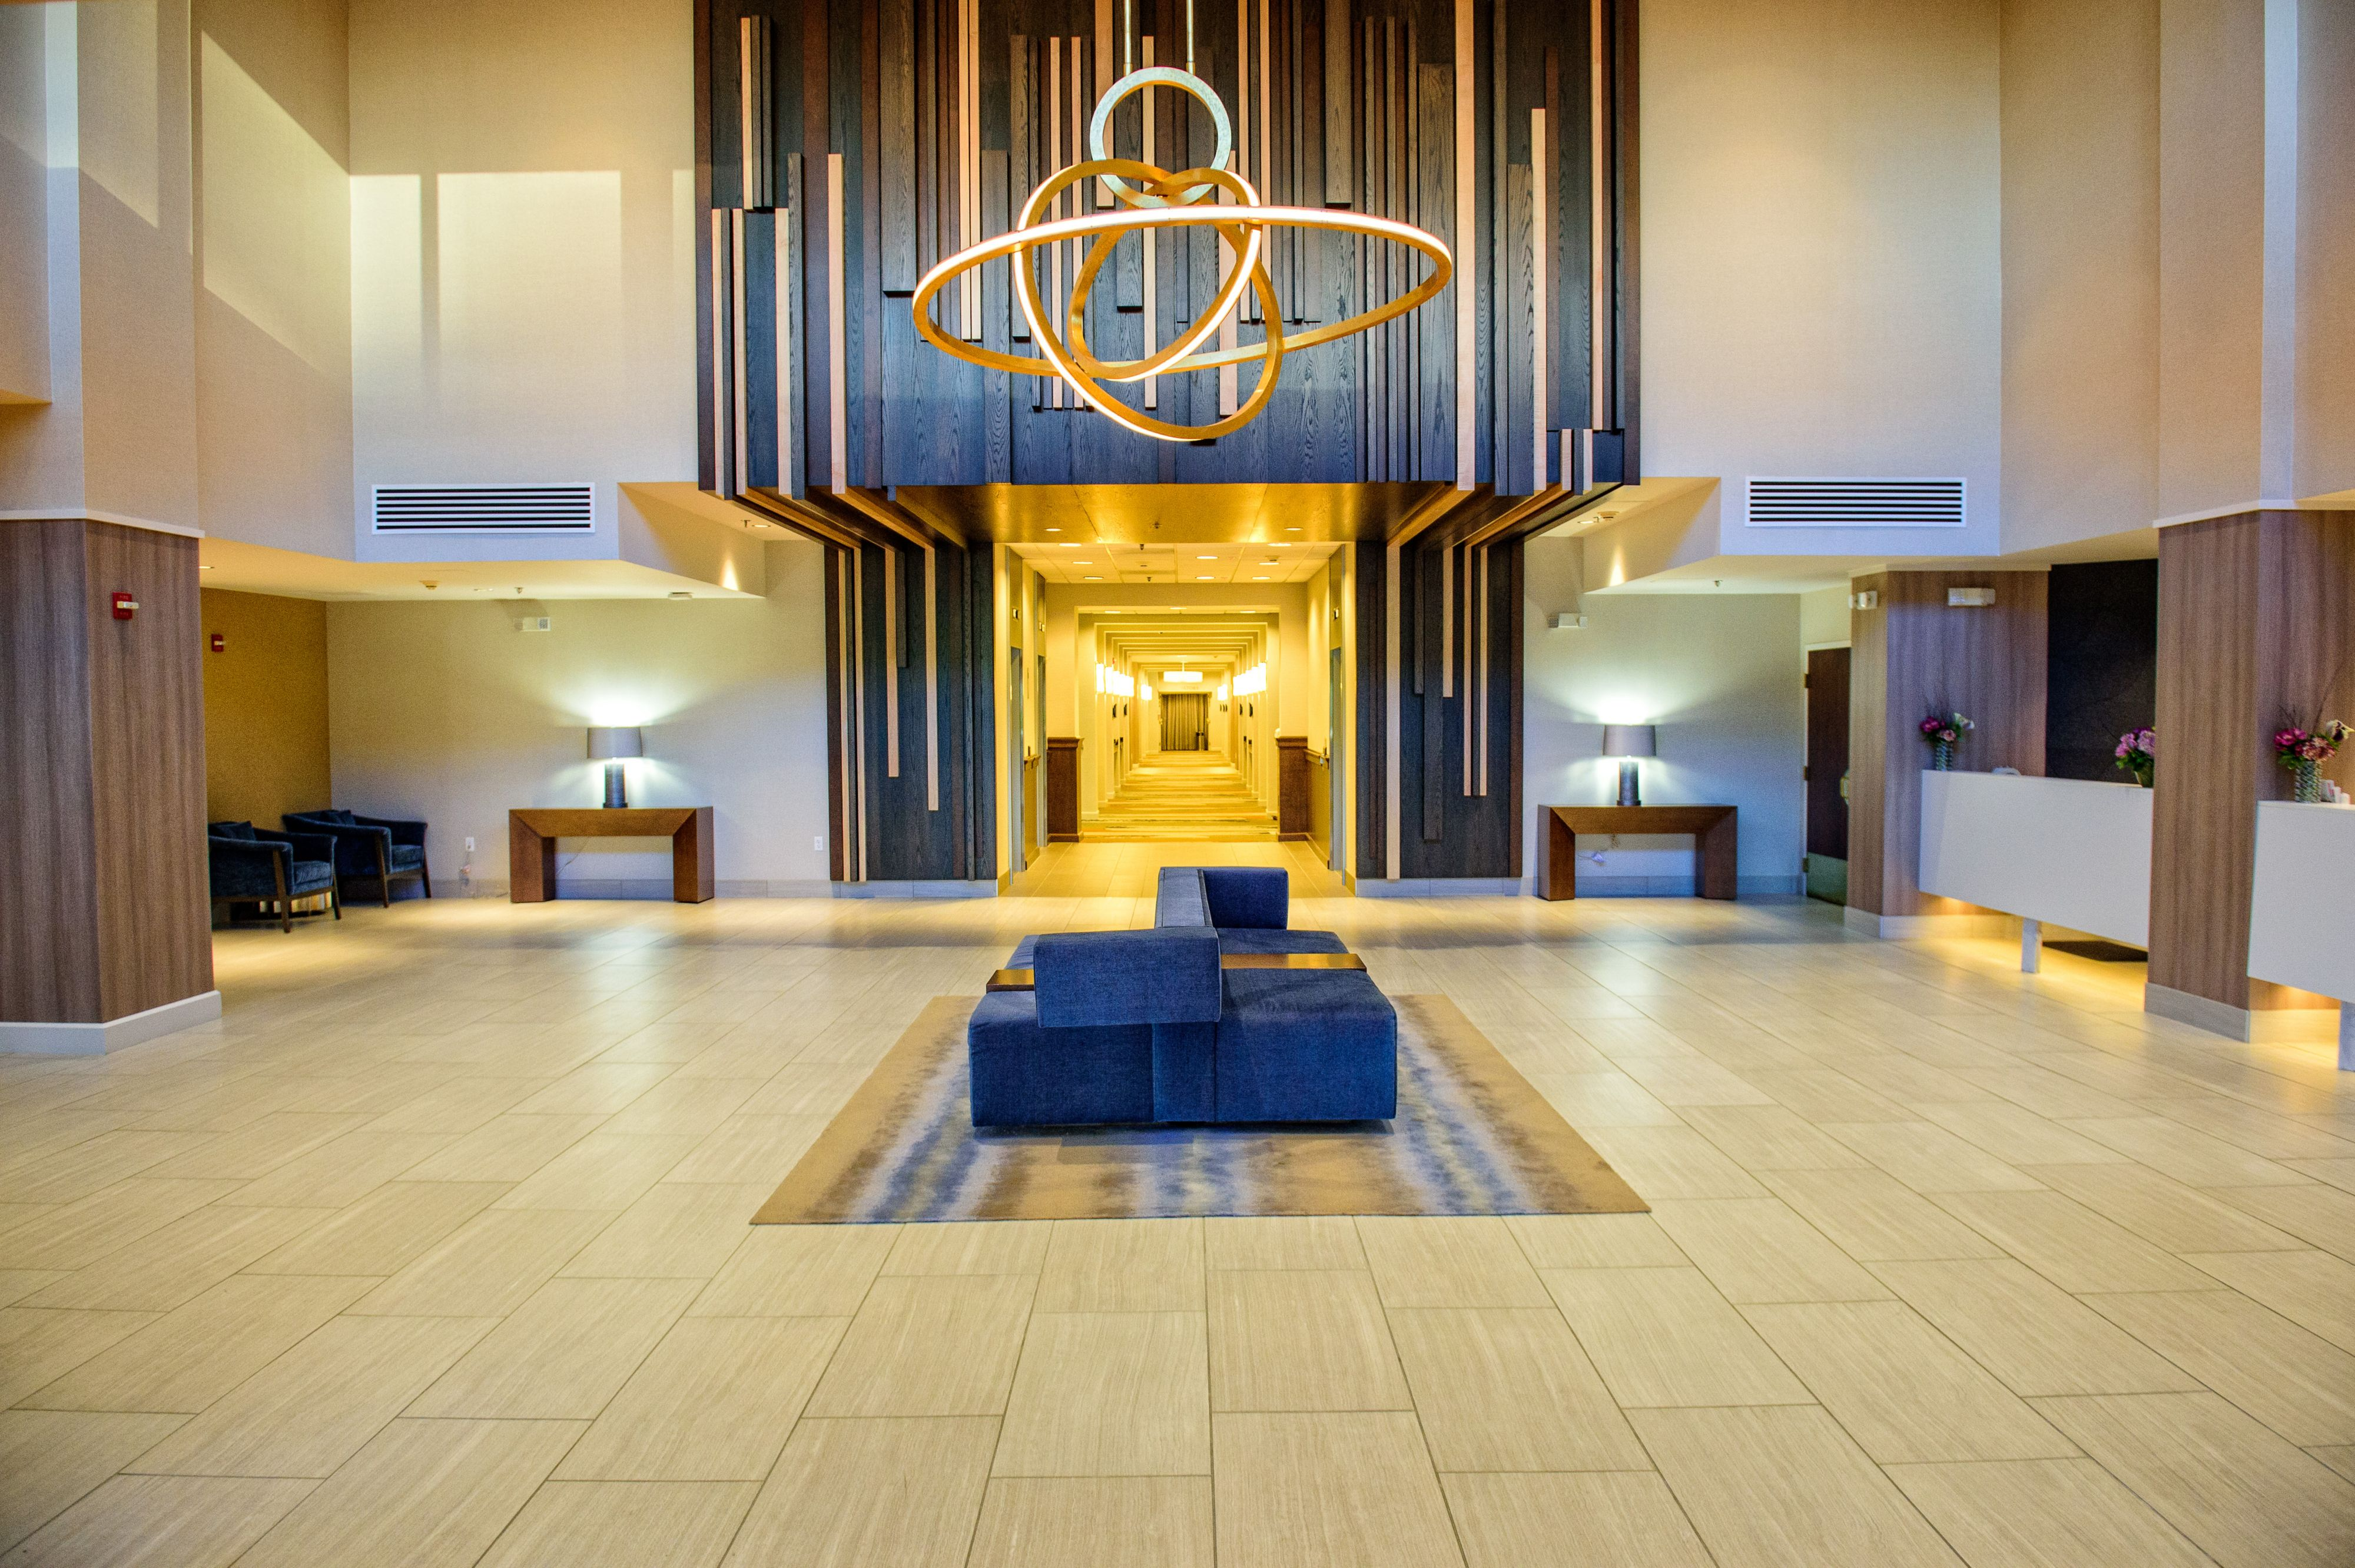 Crowne Plaza Dulles Airport - Herndon, Virginia - IHG